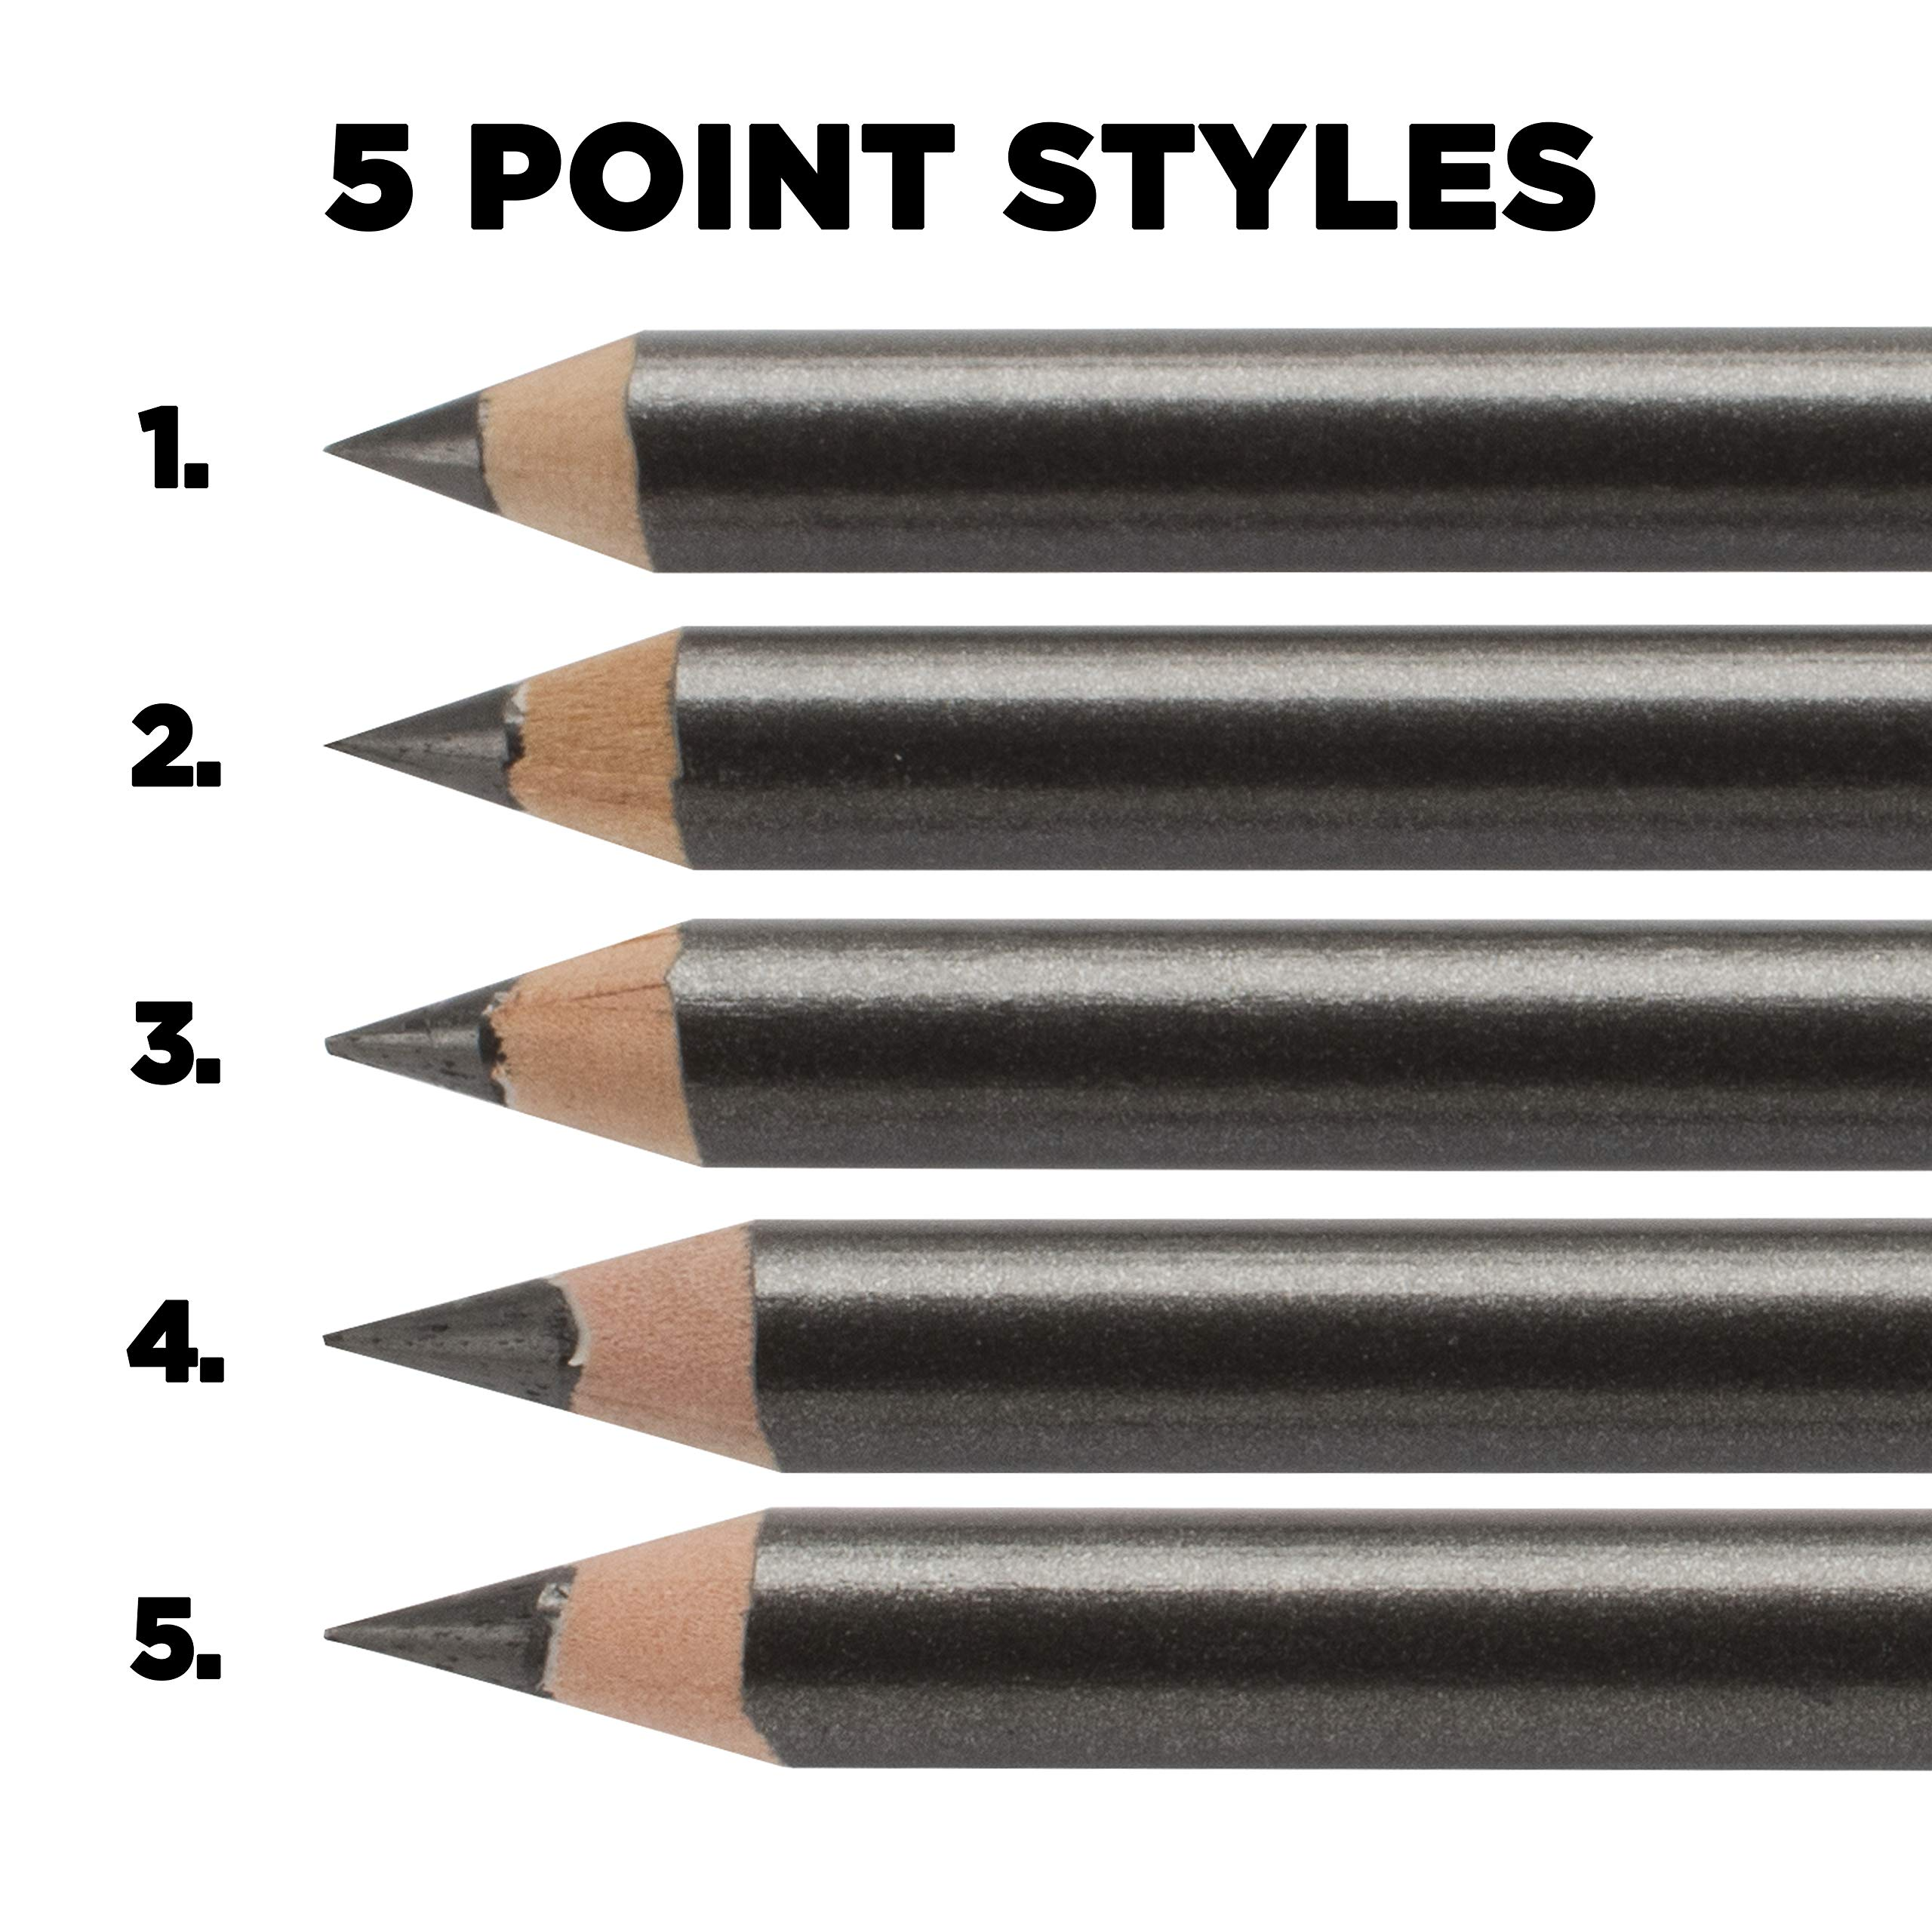 Prismacolor Colored Pencils Art Kit - Artist Premier Wooden Soft Core Pencils 150 ct. With Acurit Dial-a-Point Pencil Sharpener [151 pc. Set] by Prisamcolor (Image #4)